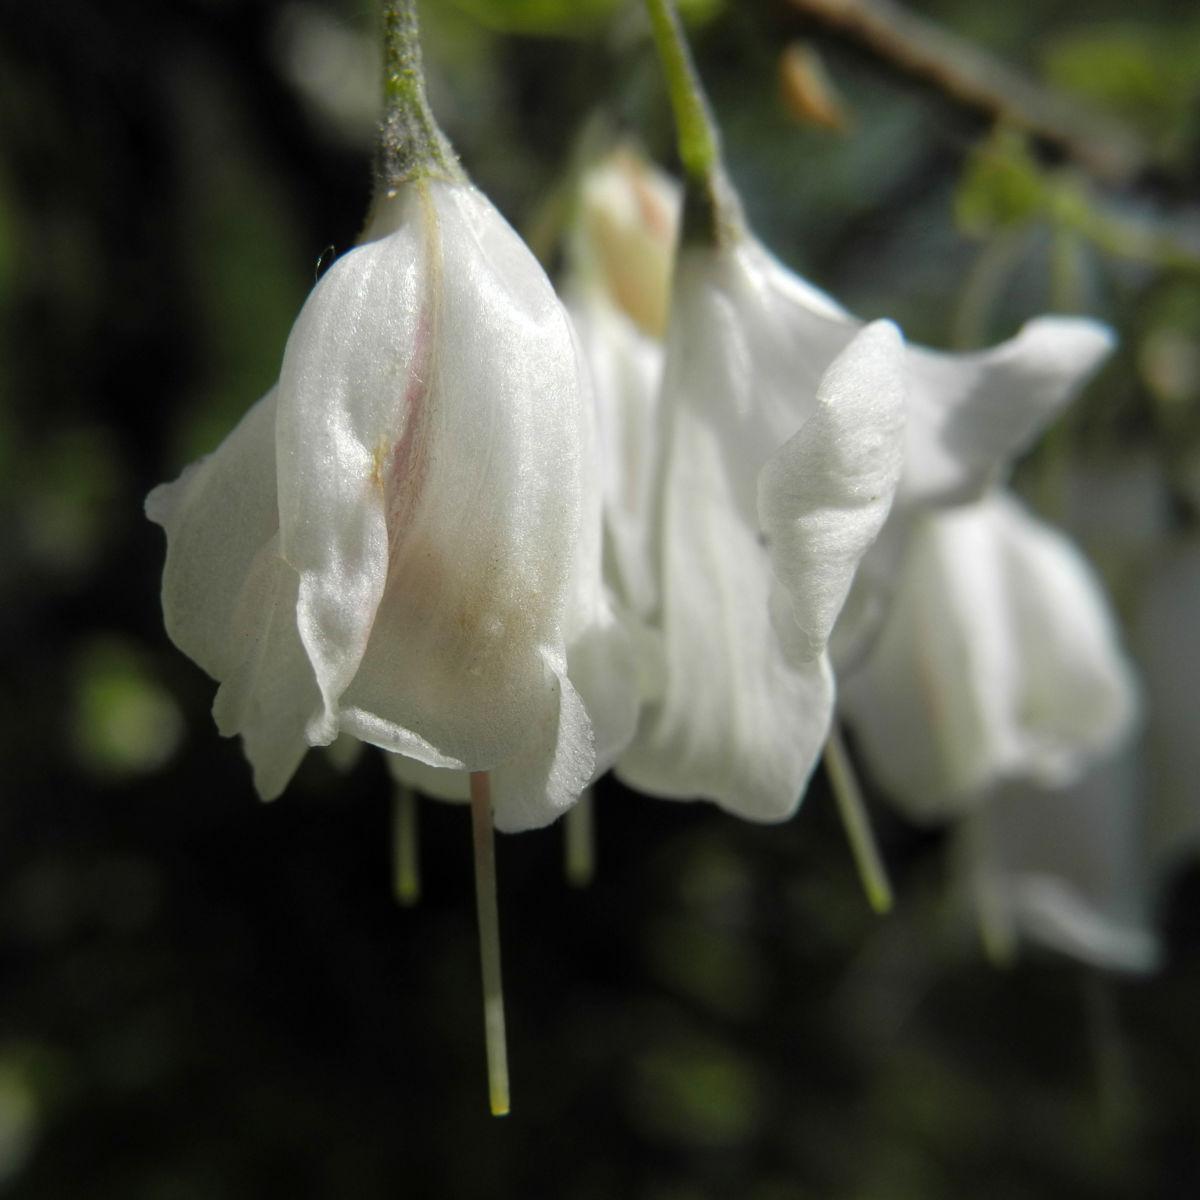 Carolina Maigloeckchenbaum Bluete weiß Halesia carolina